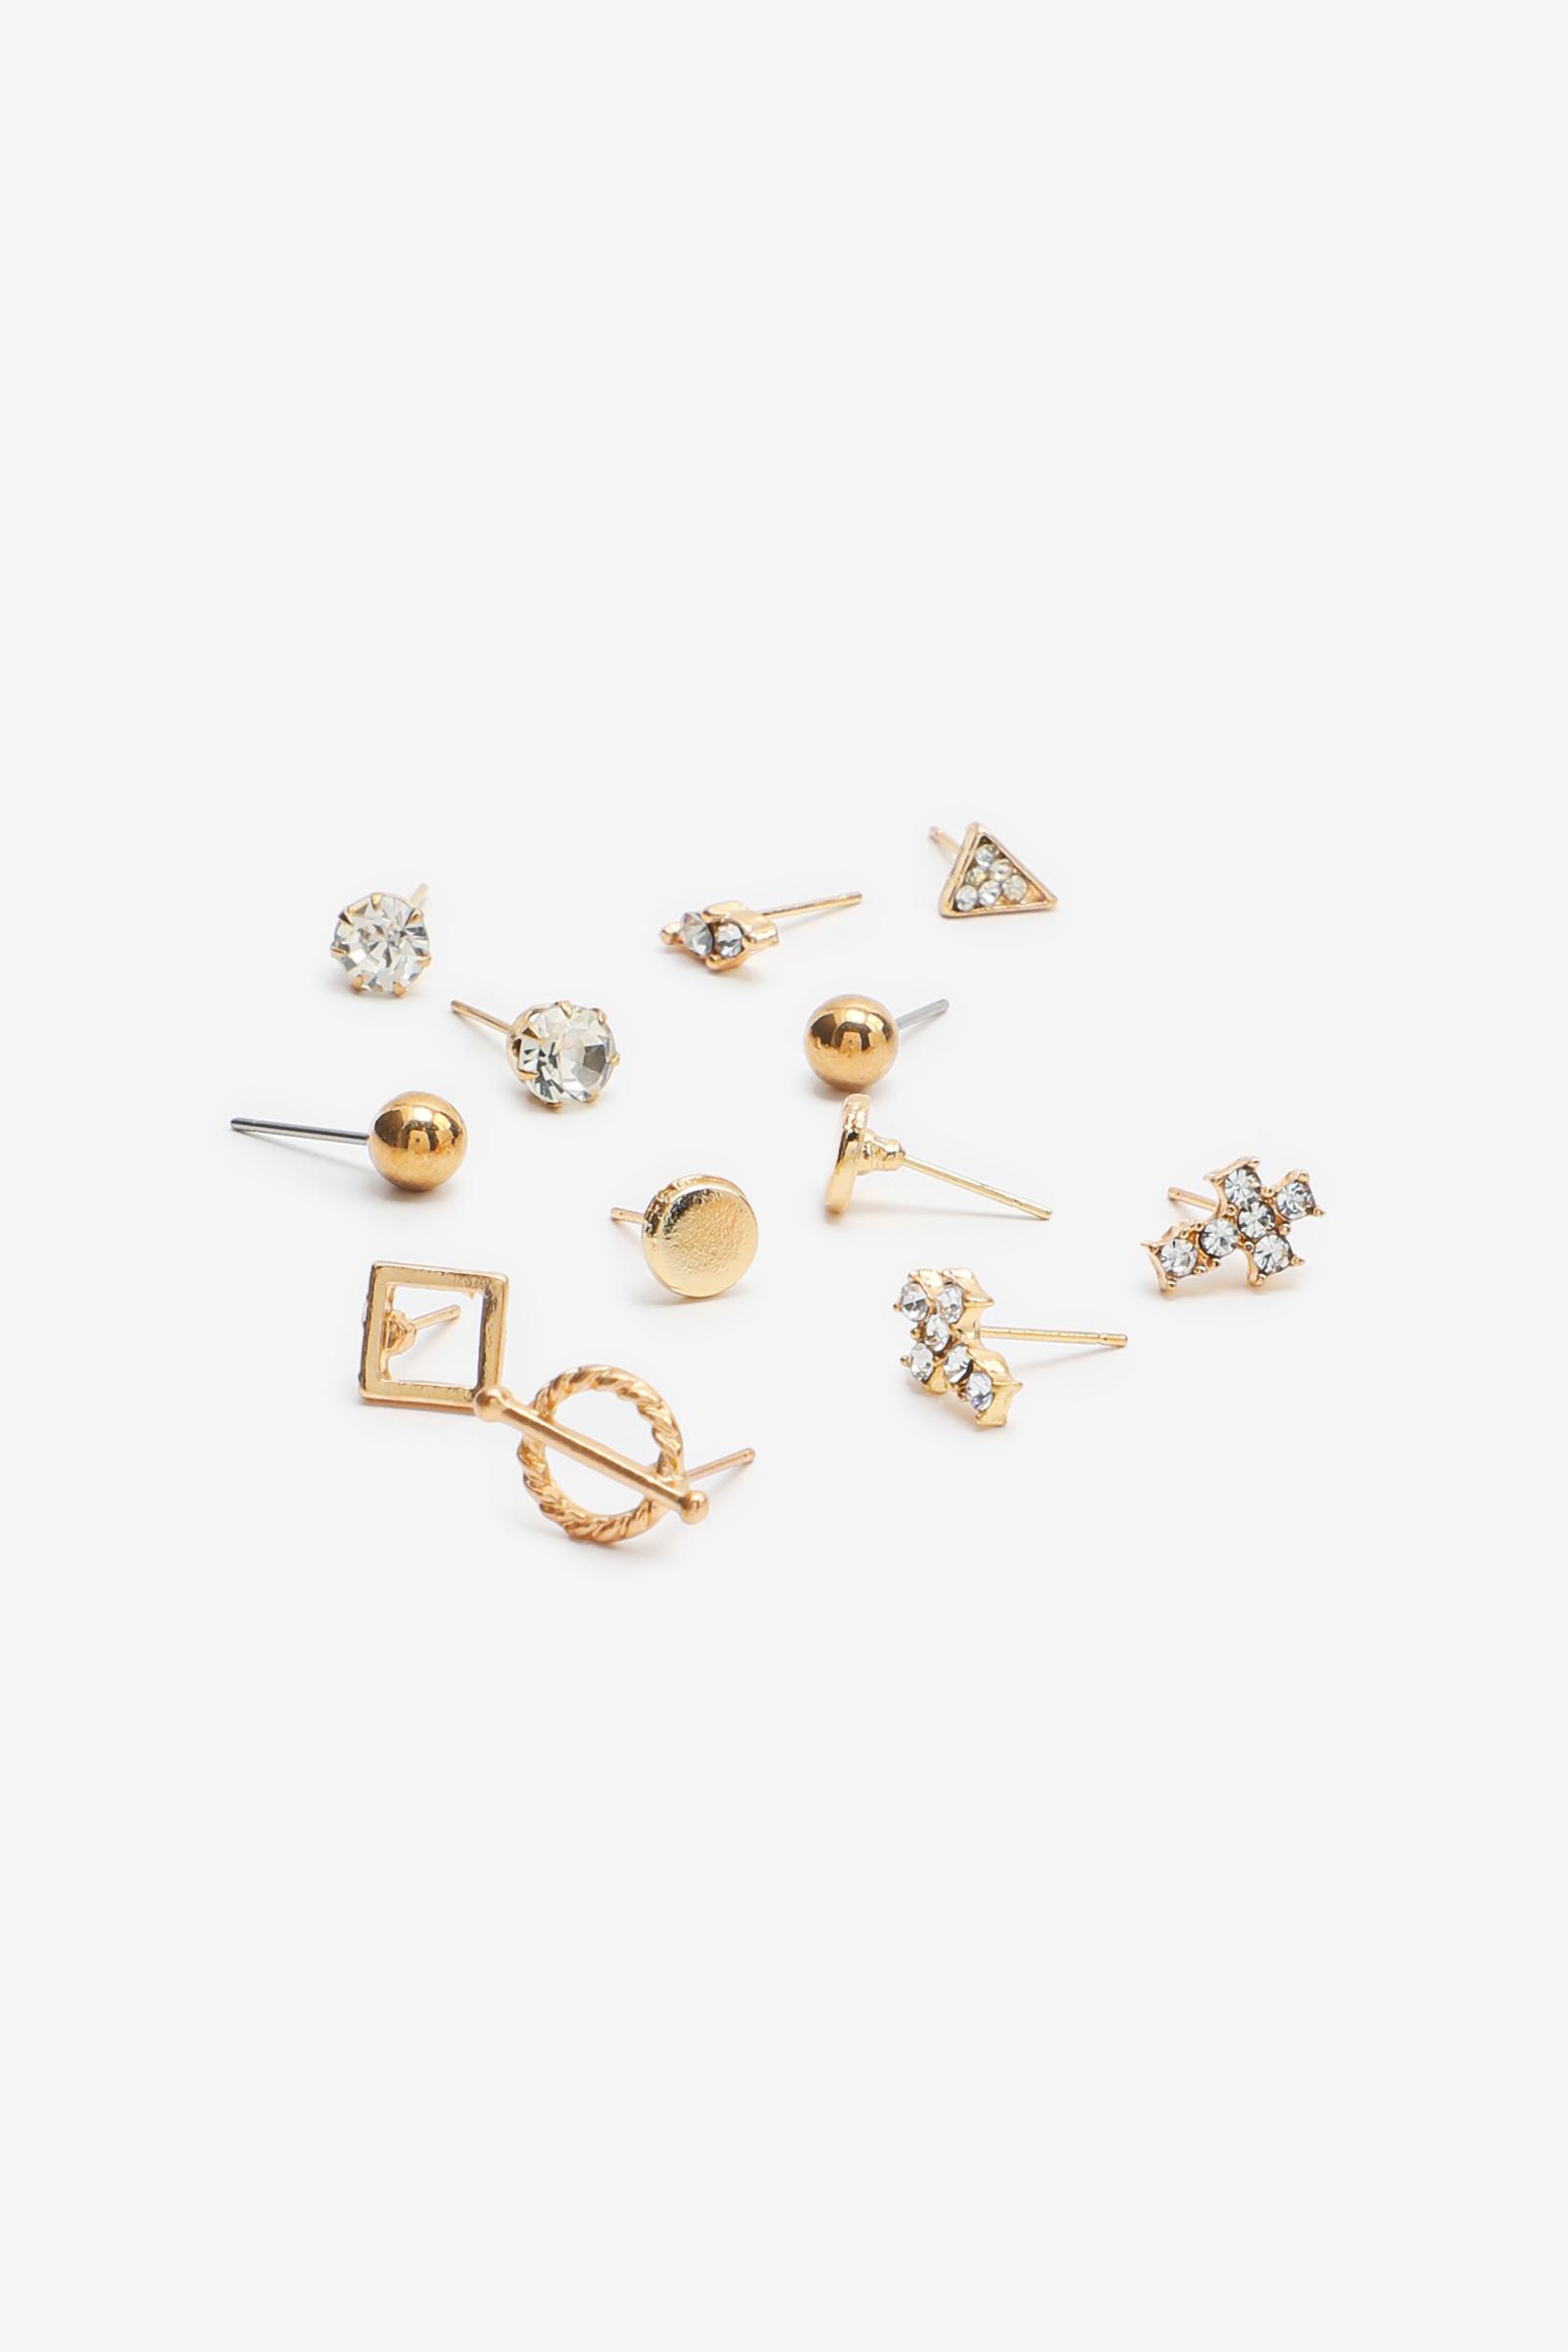 Pack of Assorted Earrings